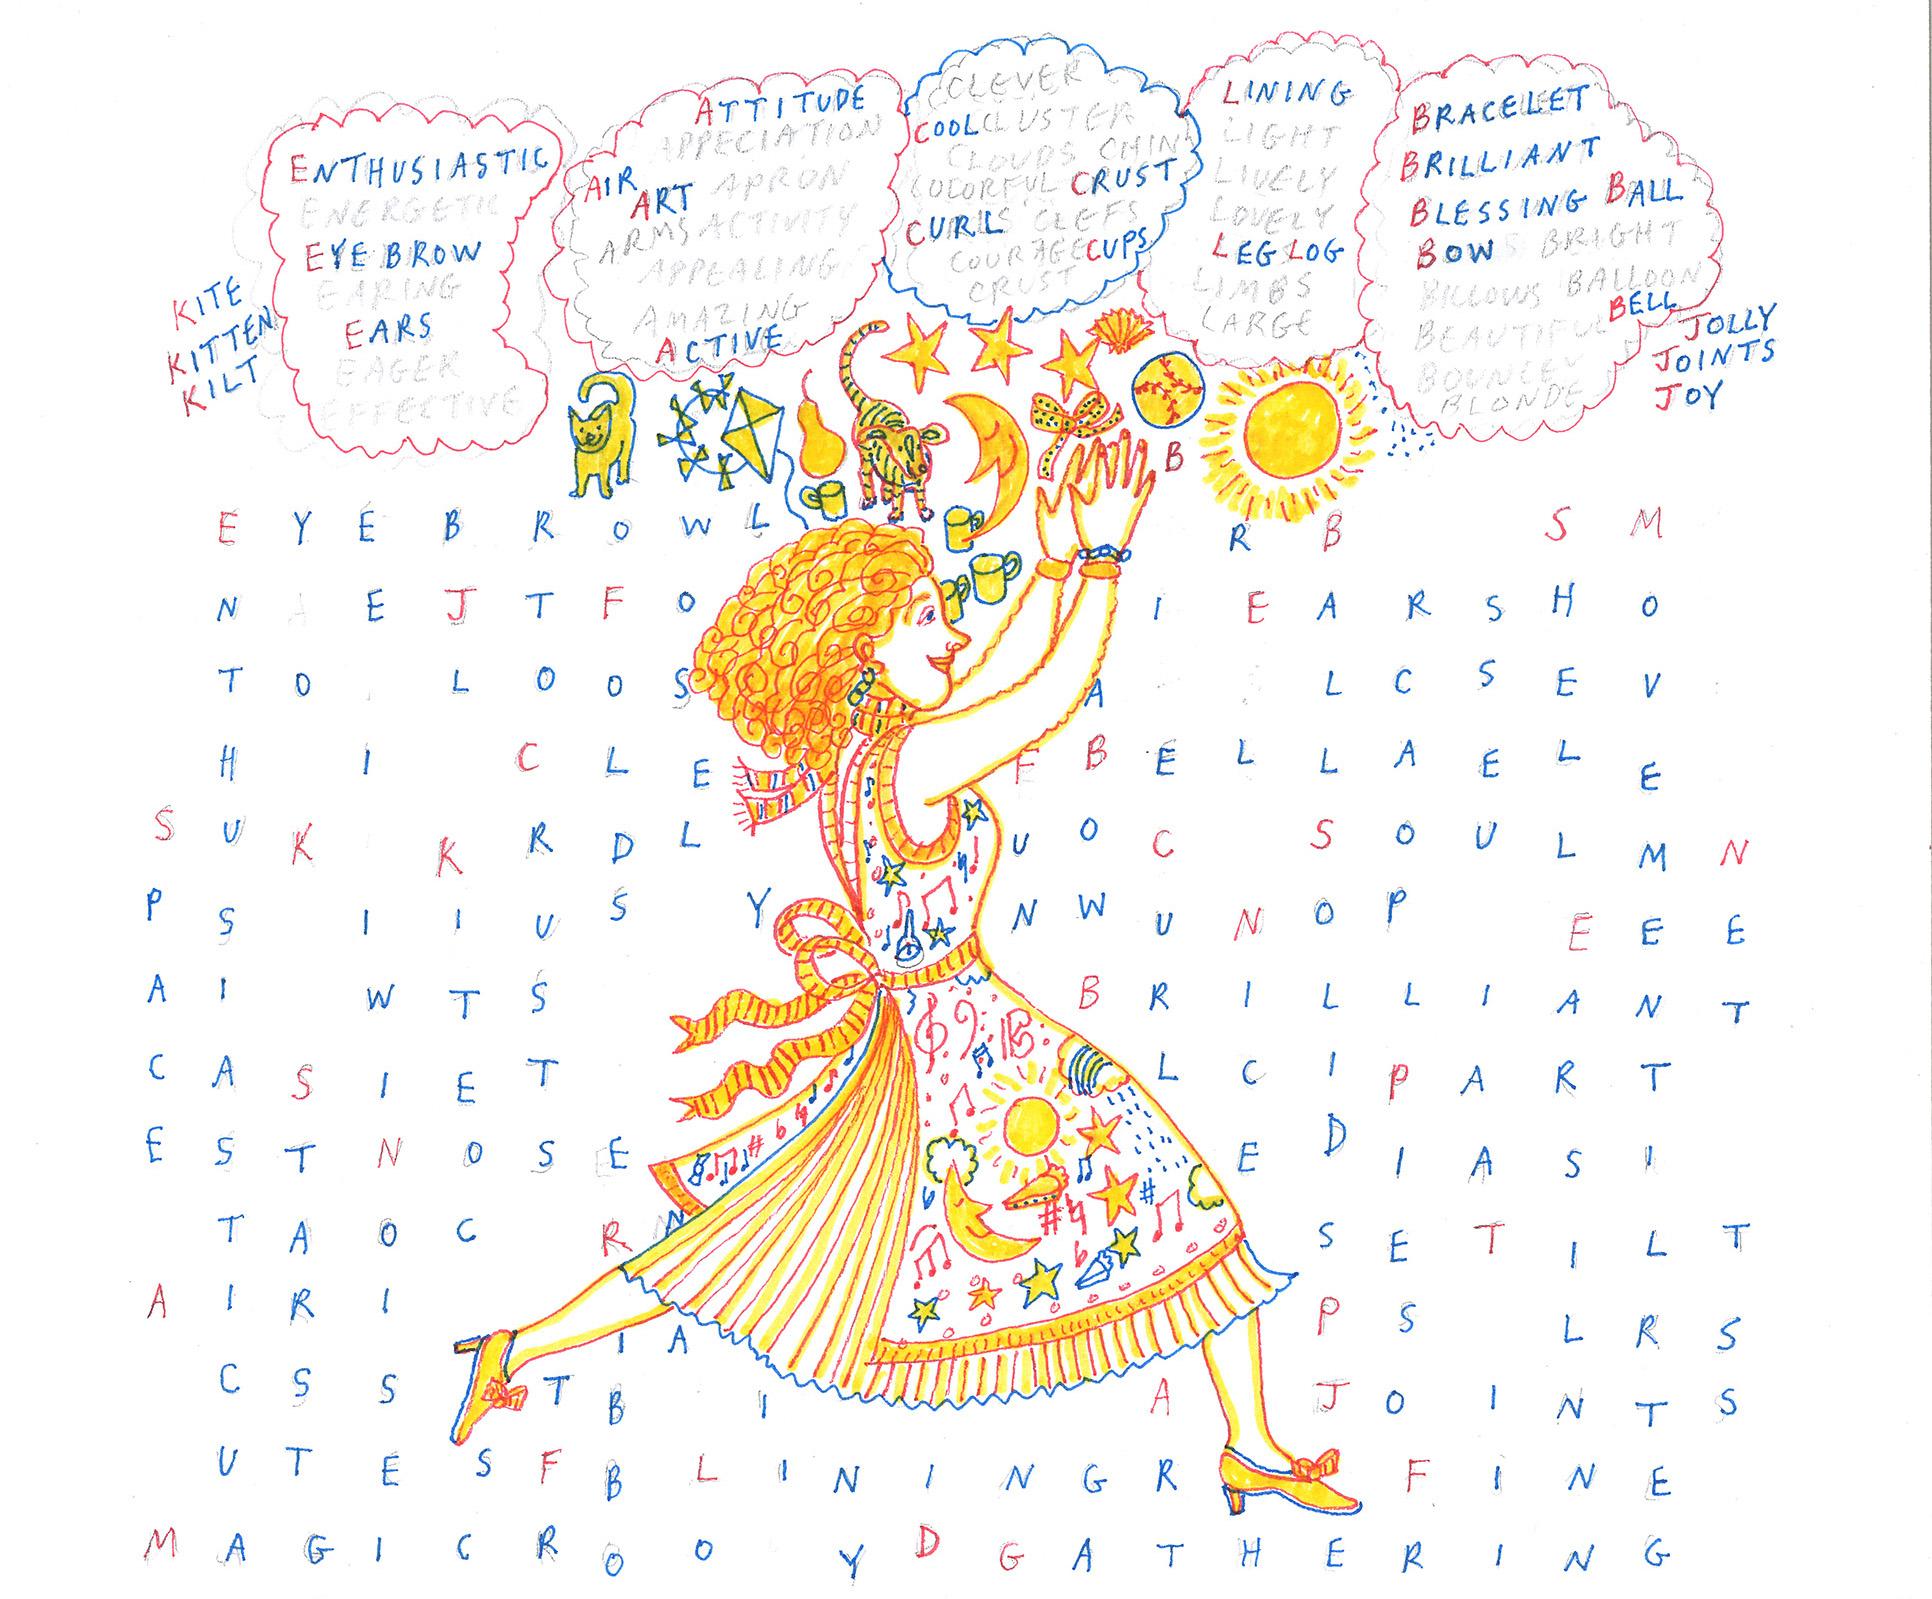 Enthusiastic puzzle _ Lonni Sue Johnson_80%1 copy.jpg